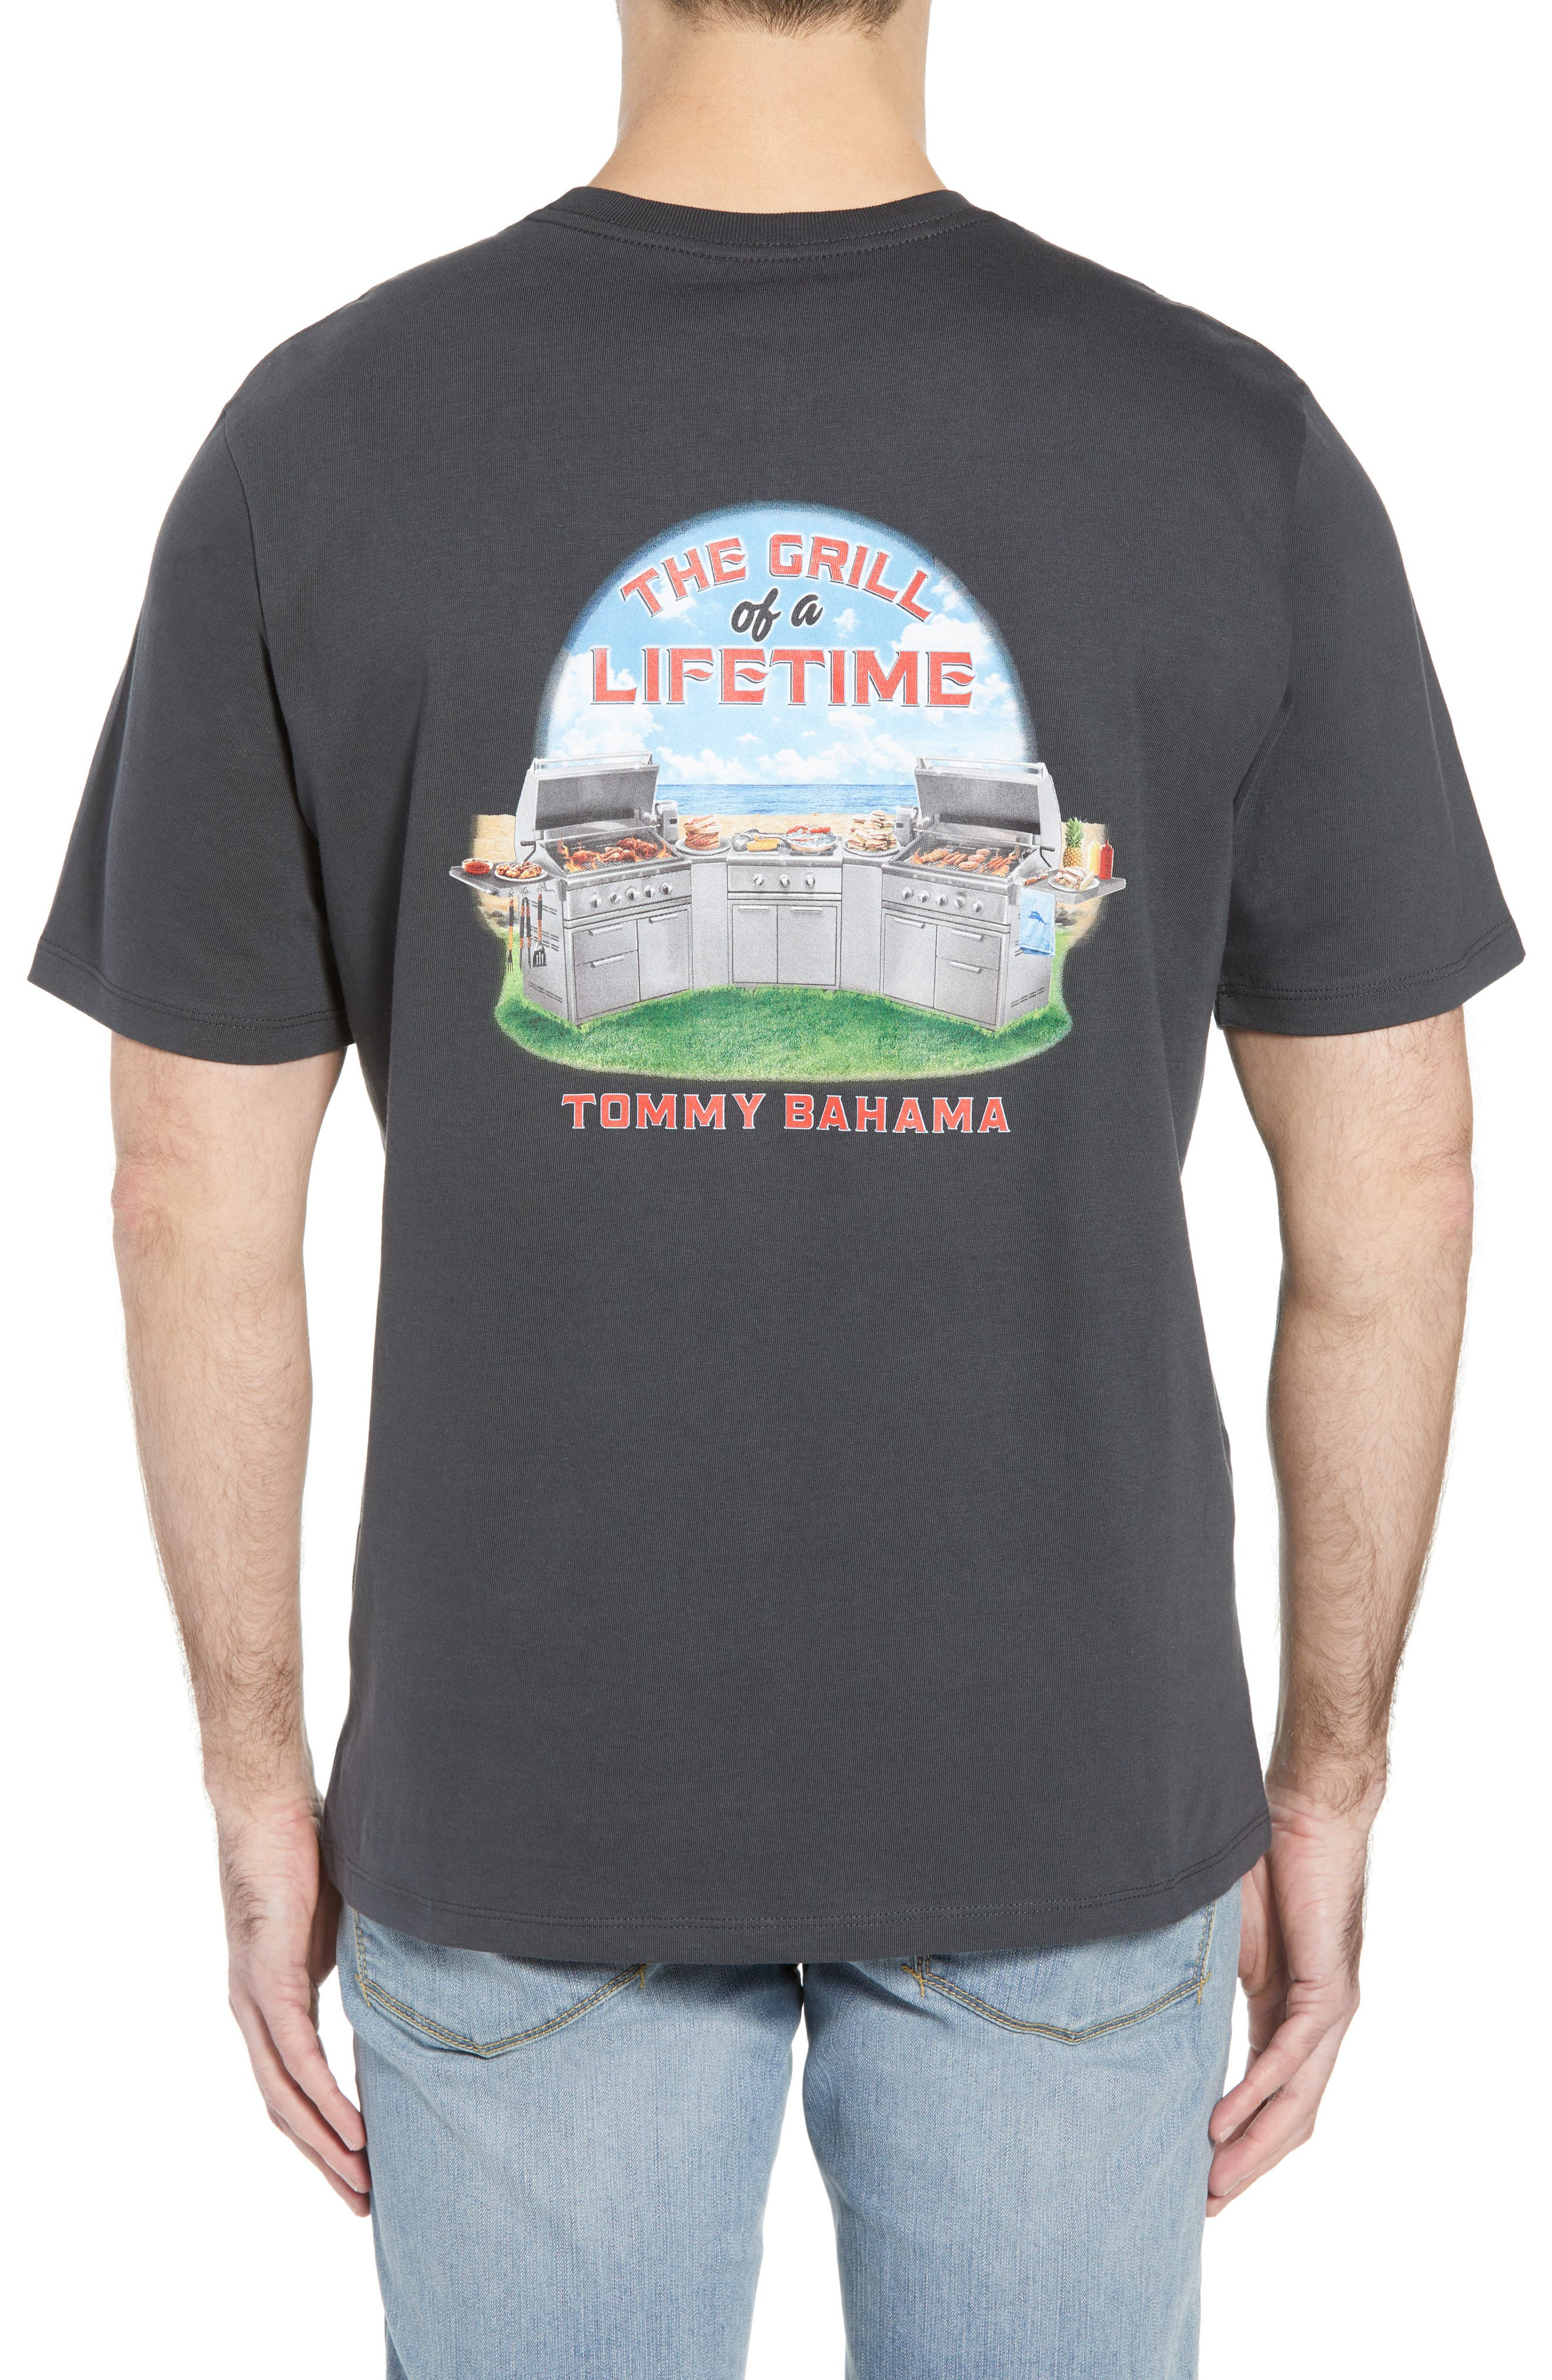 Grill of a Lifetime T-Shirt,                             Alternate thumbnail 2, color,                             Coal